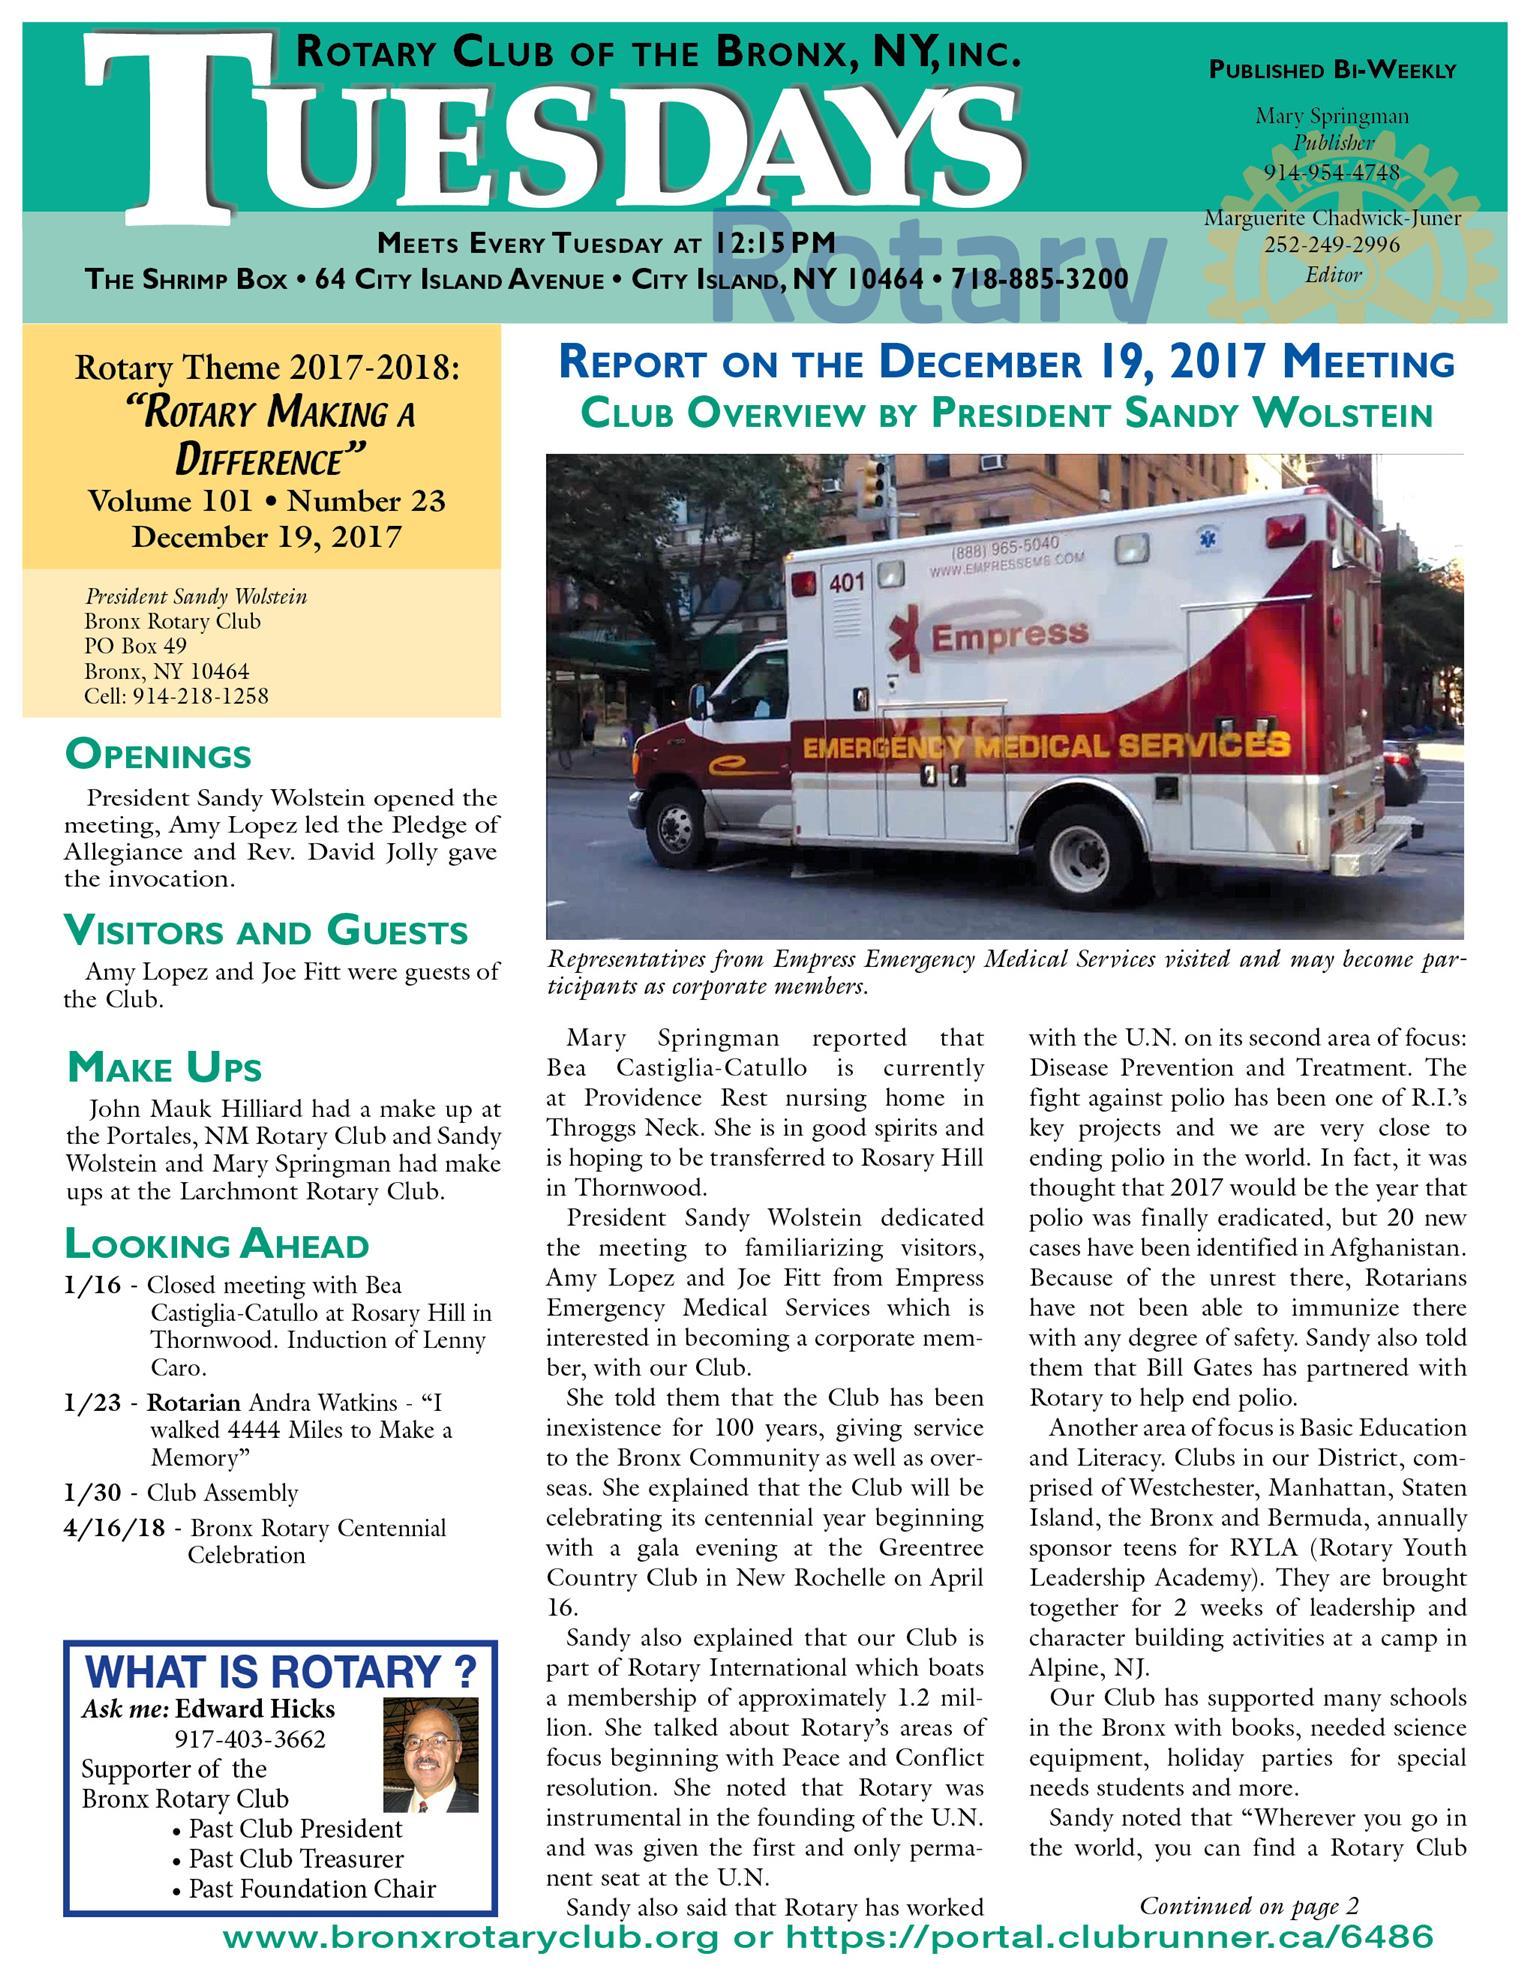 Tuesdays Newsletter 12/19 & 12/26/17 & 1/9/18 p1